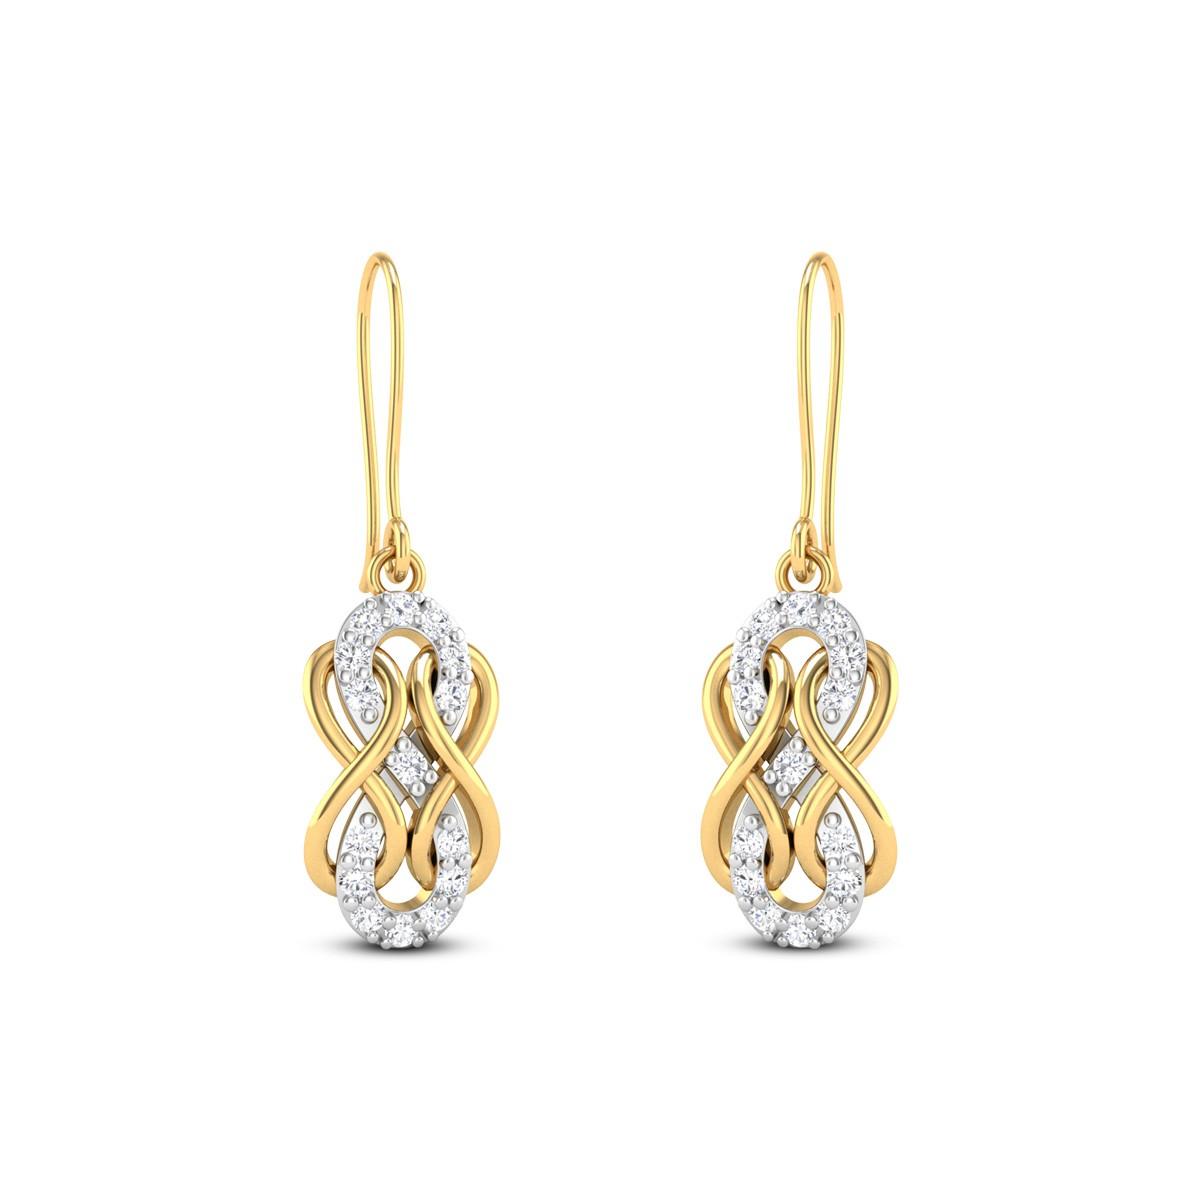 Cornaro Diamond Earrings